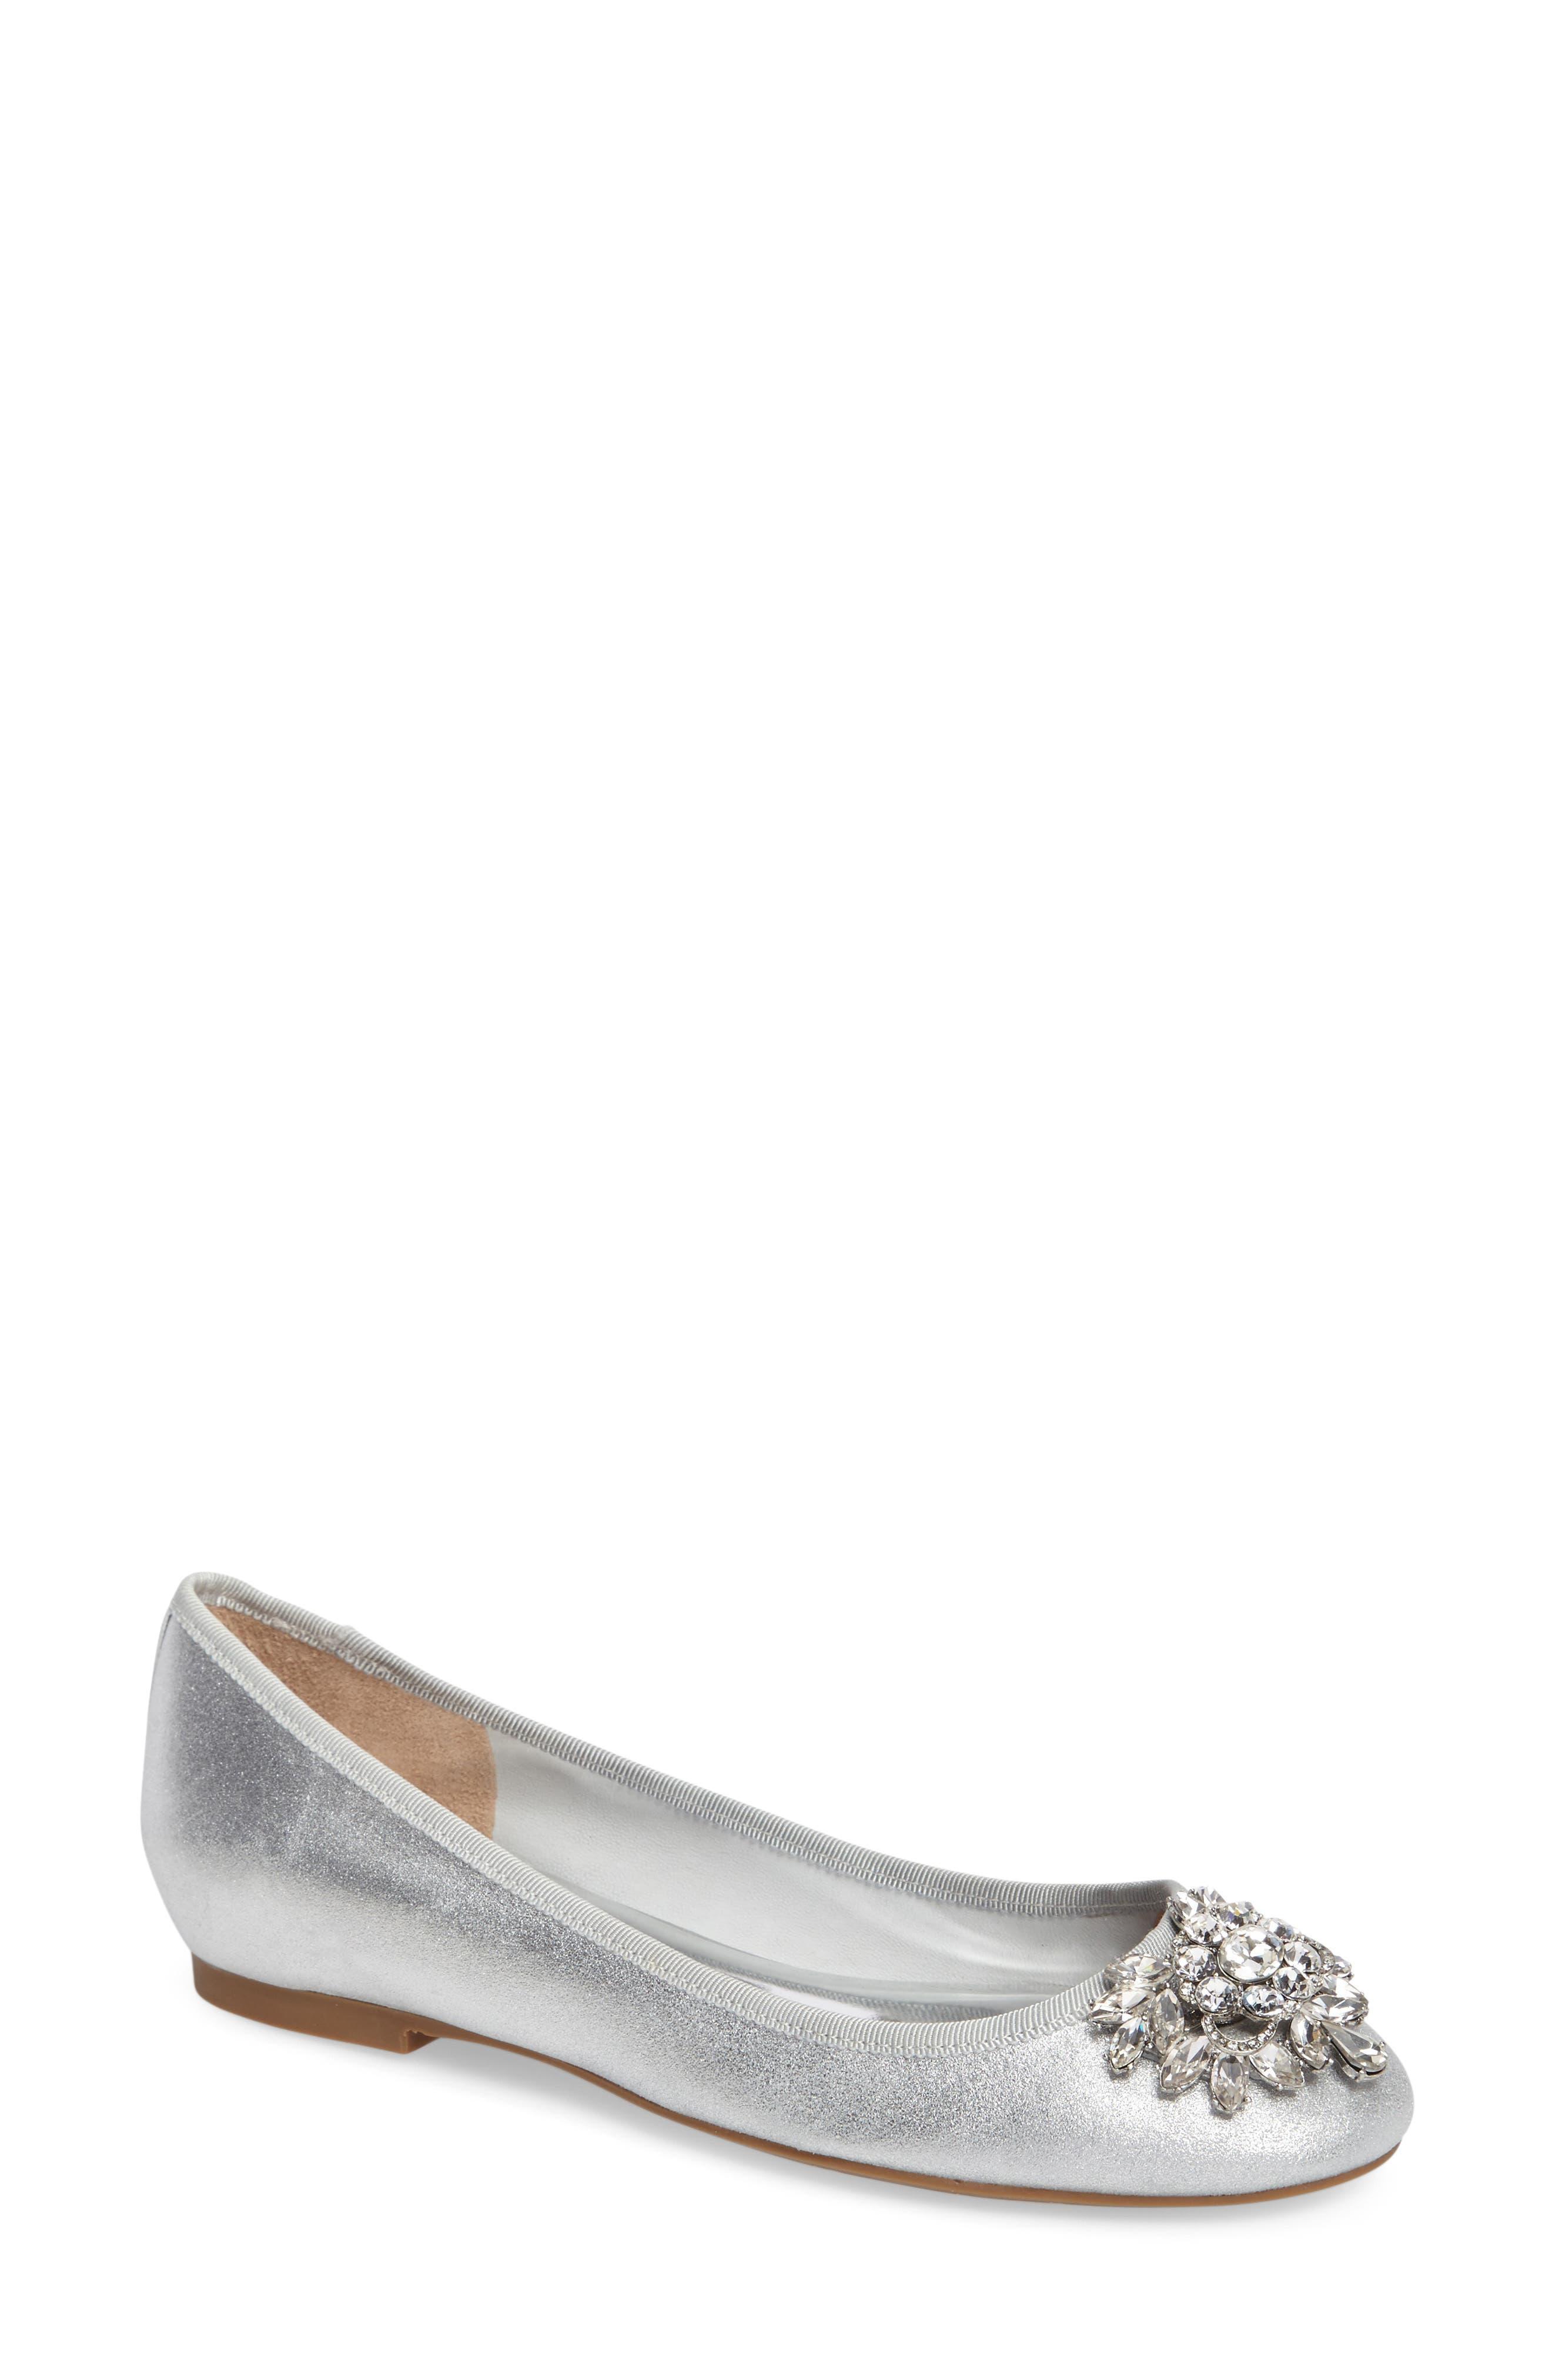 BADGLEY MISCHKA Bianca Embellished Ballet Flat